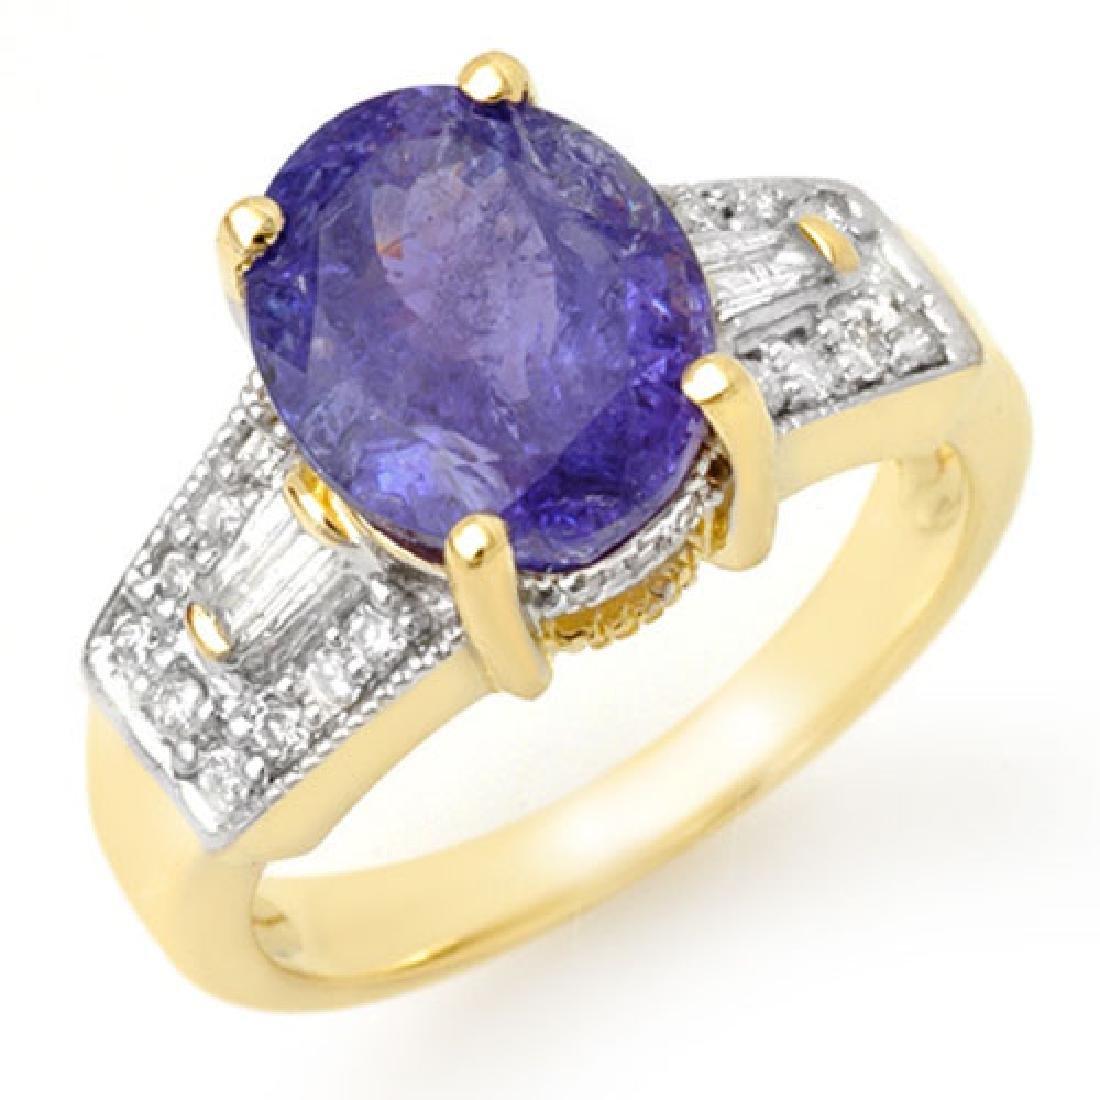 5.55 CTW Tanzanite & Diamond Ring 10K Yellow Gold